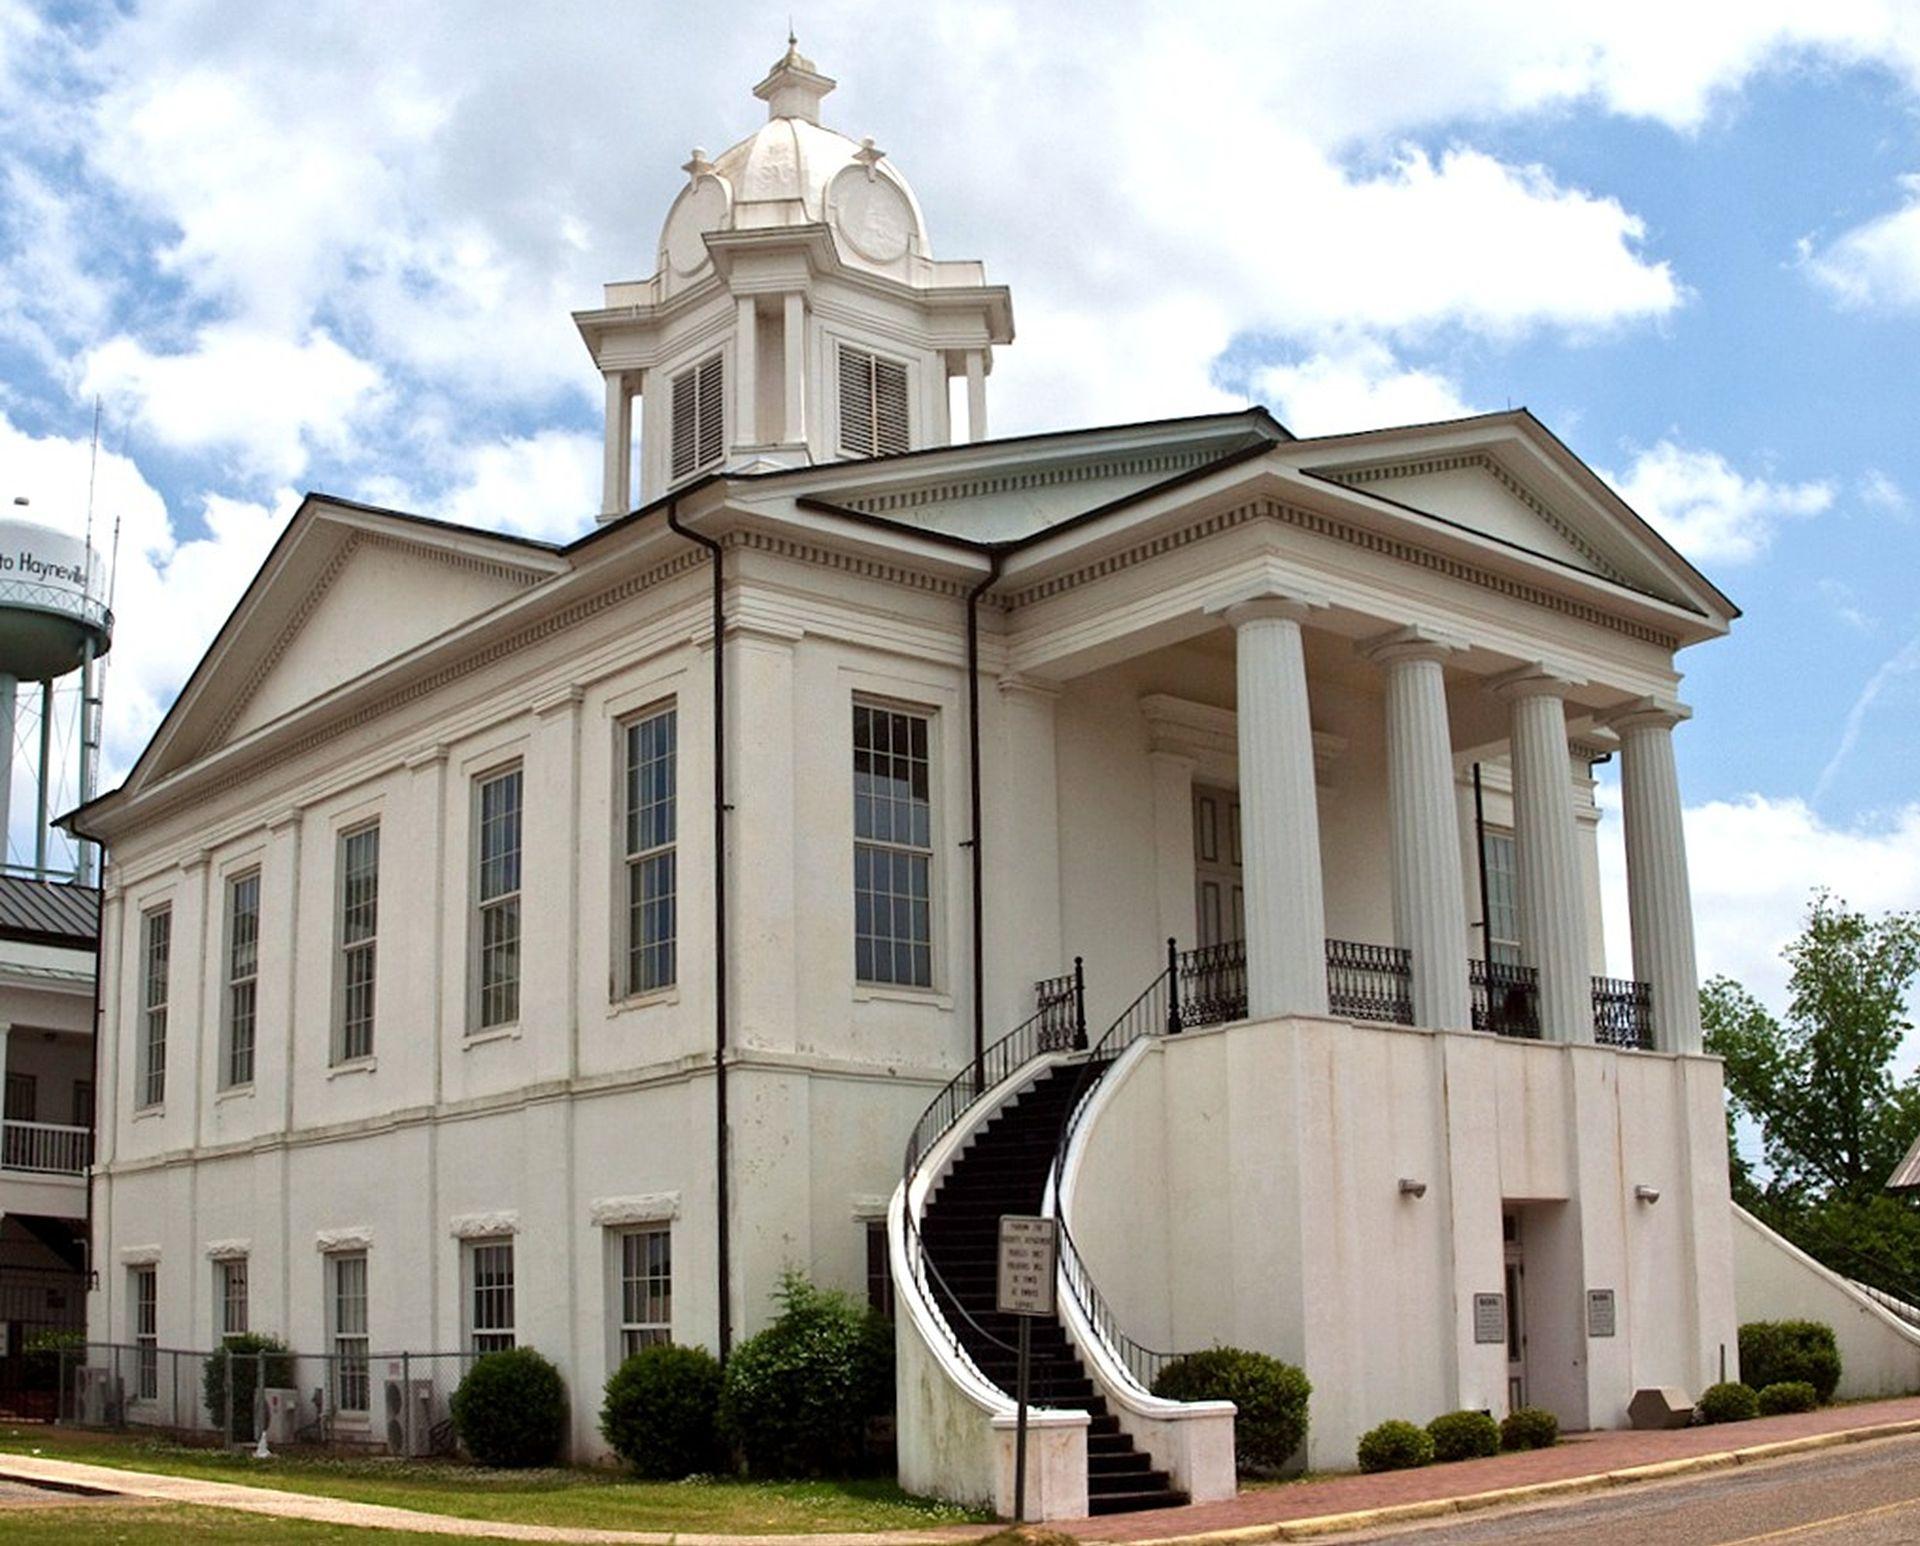 Alabama: Lowndes County, Alabama